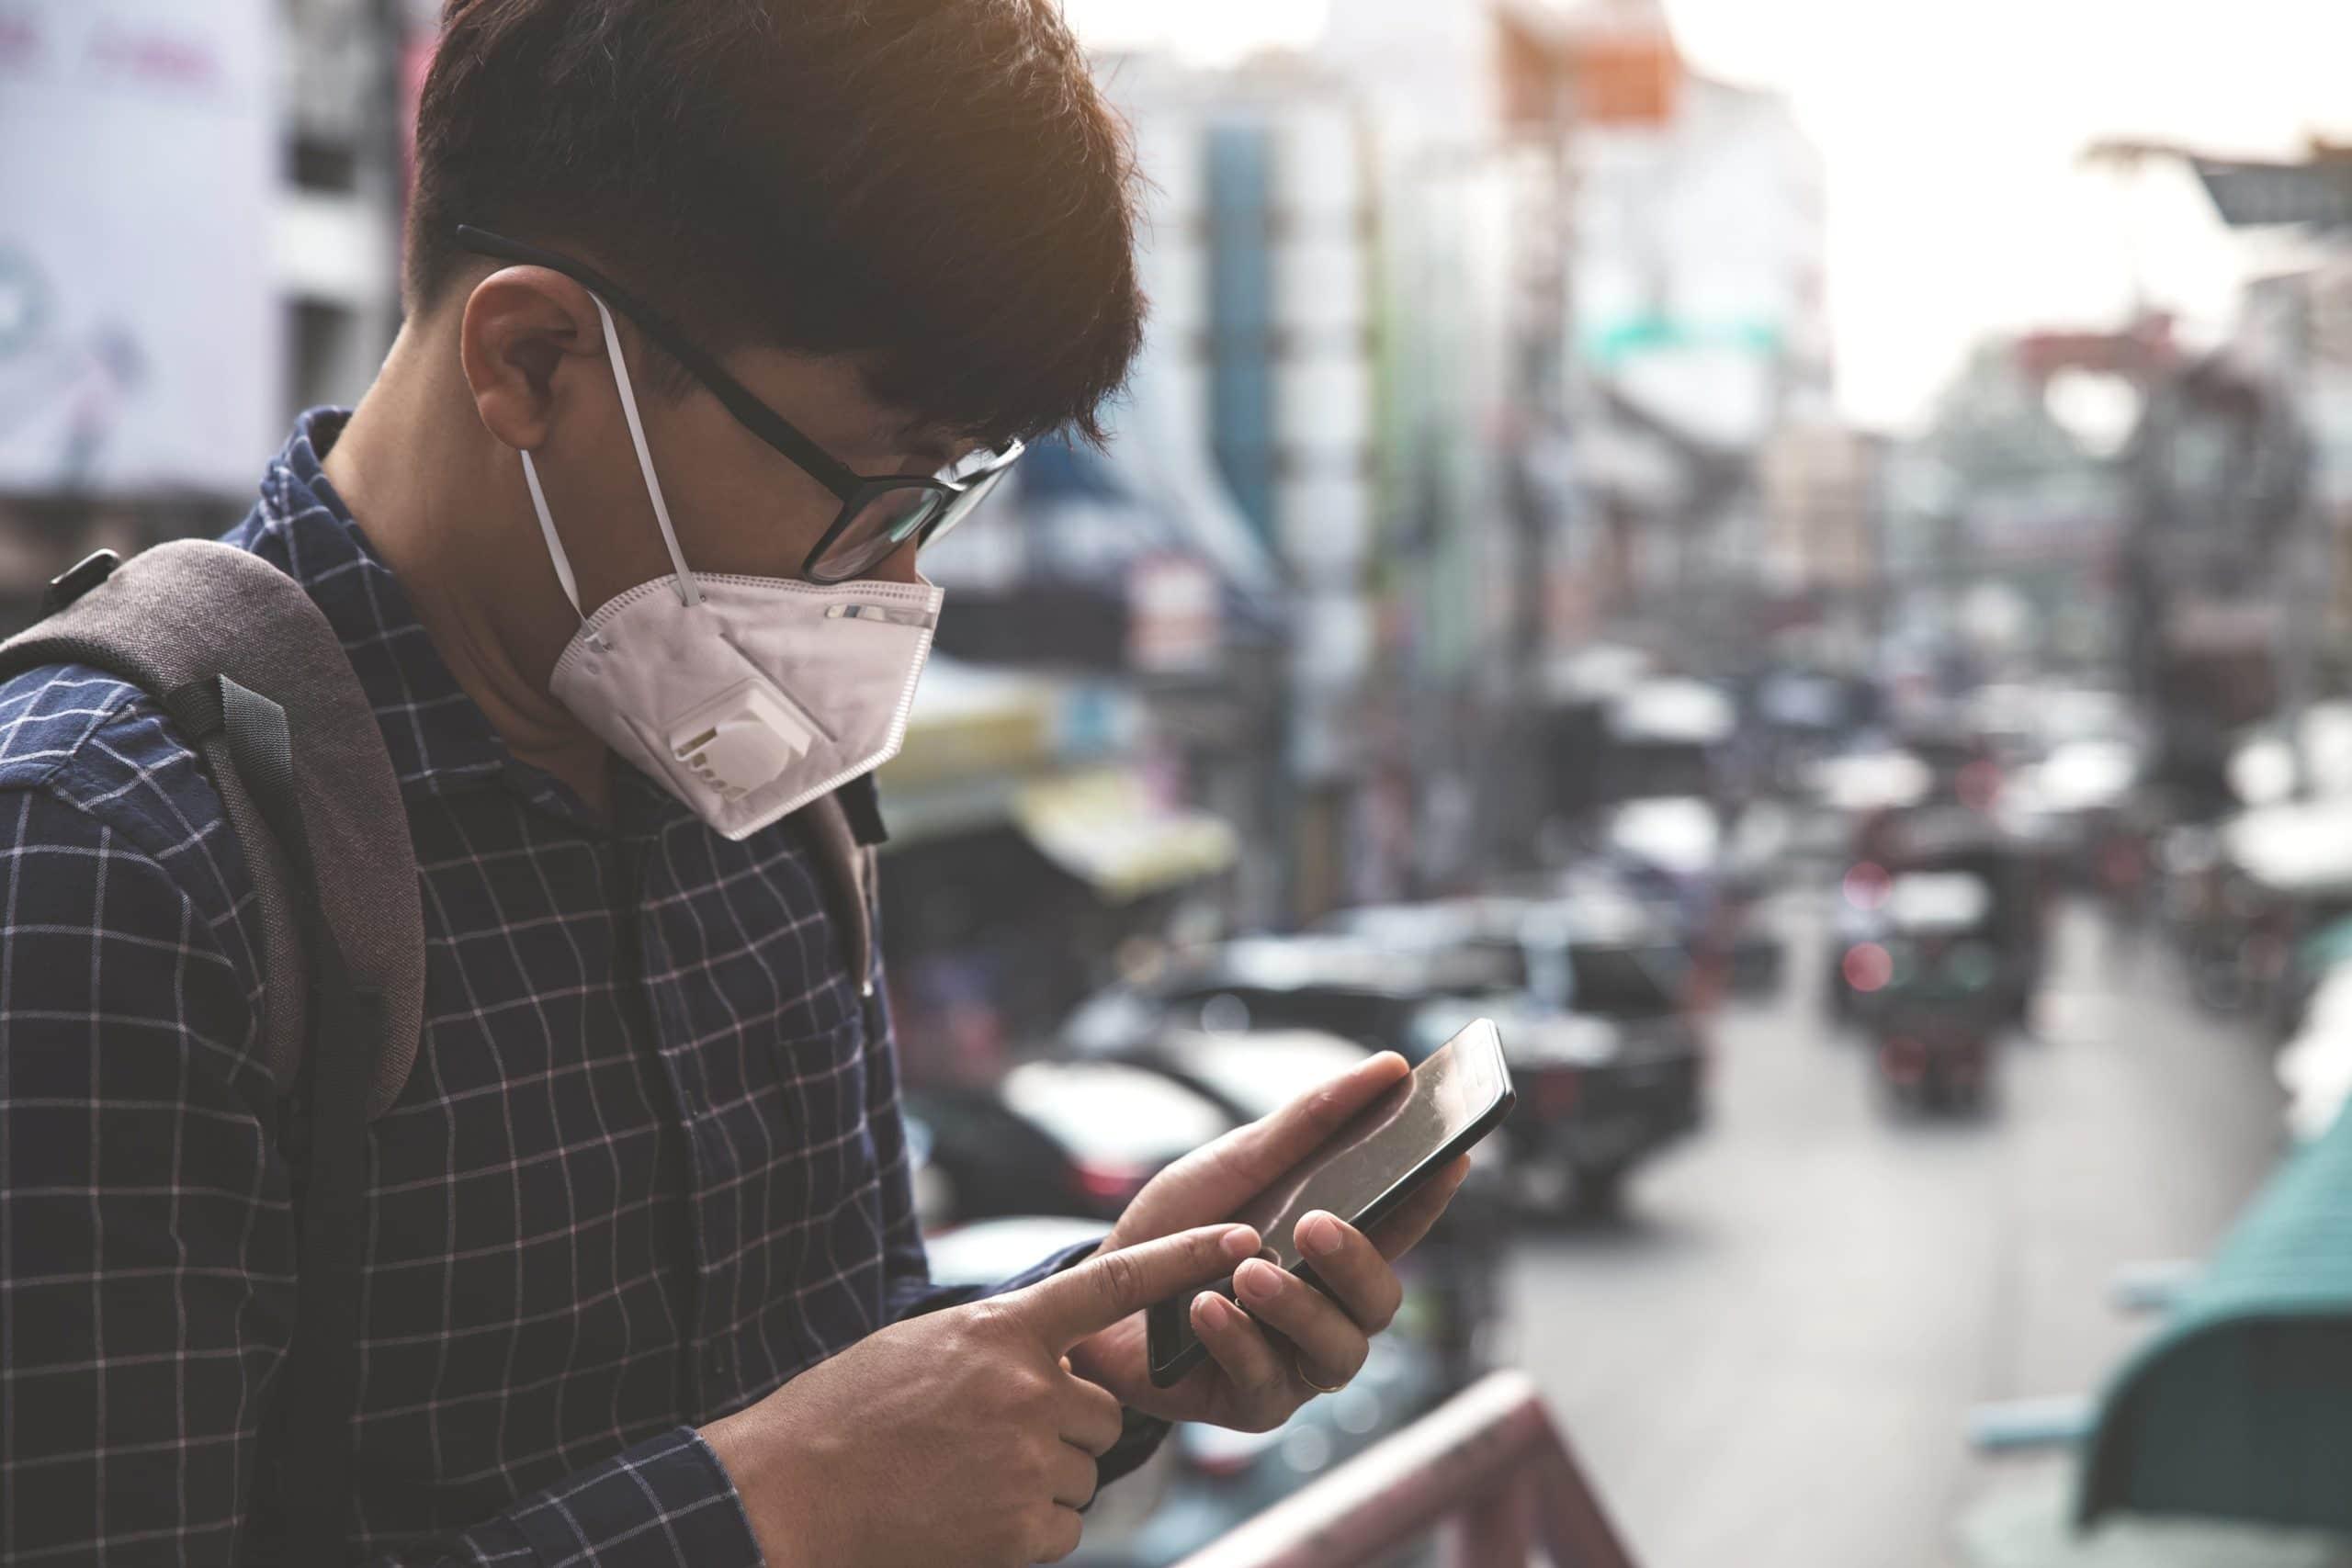 car accident victim calling on phone during coronavirus pandemic